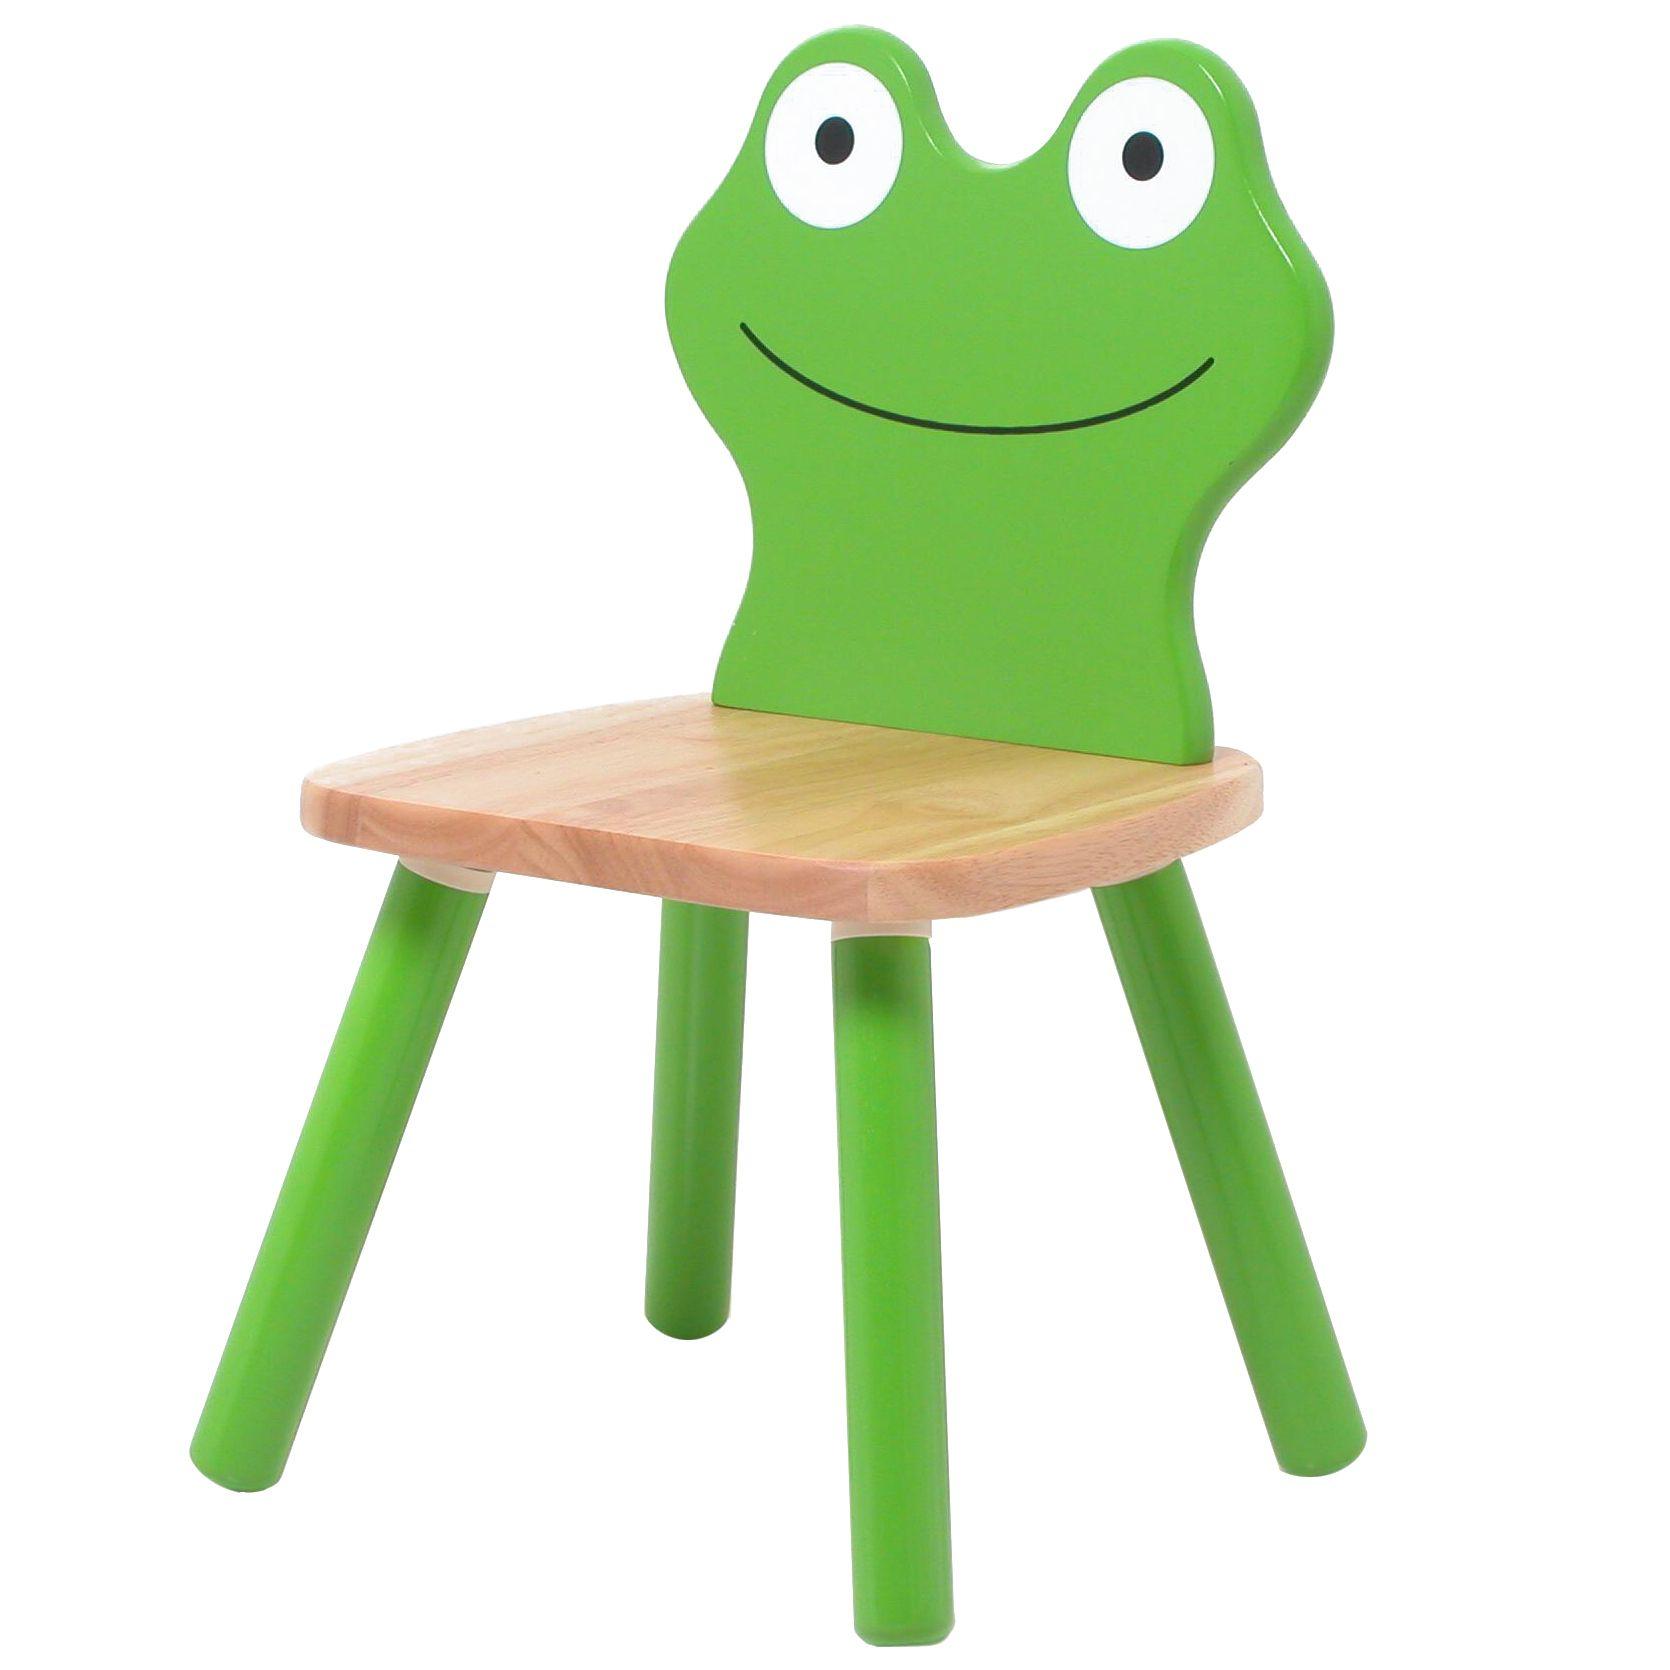 John Crane Child's Frog Chair